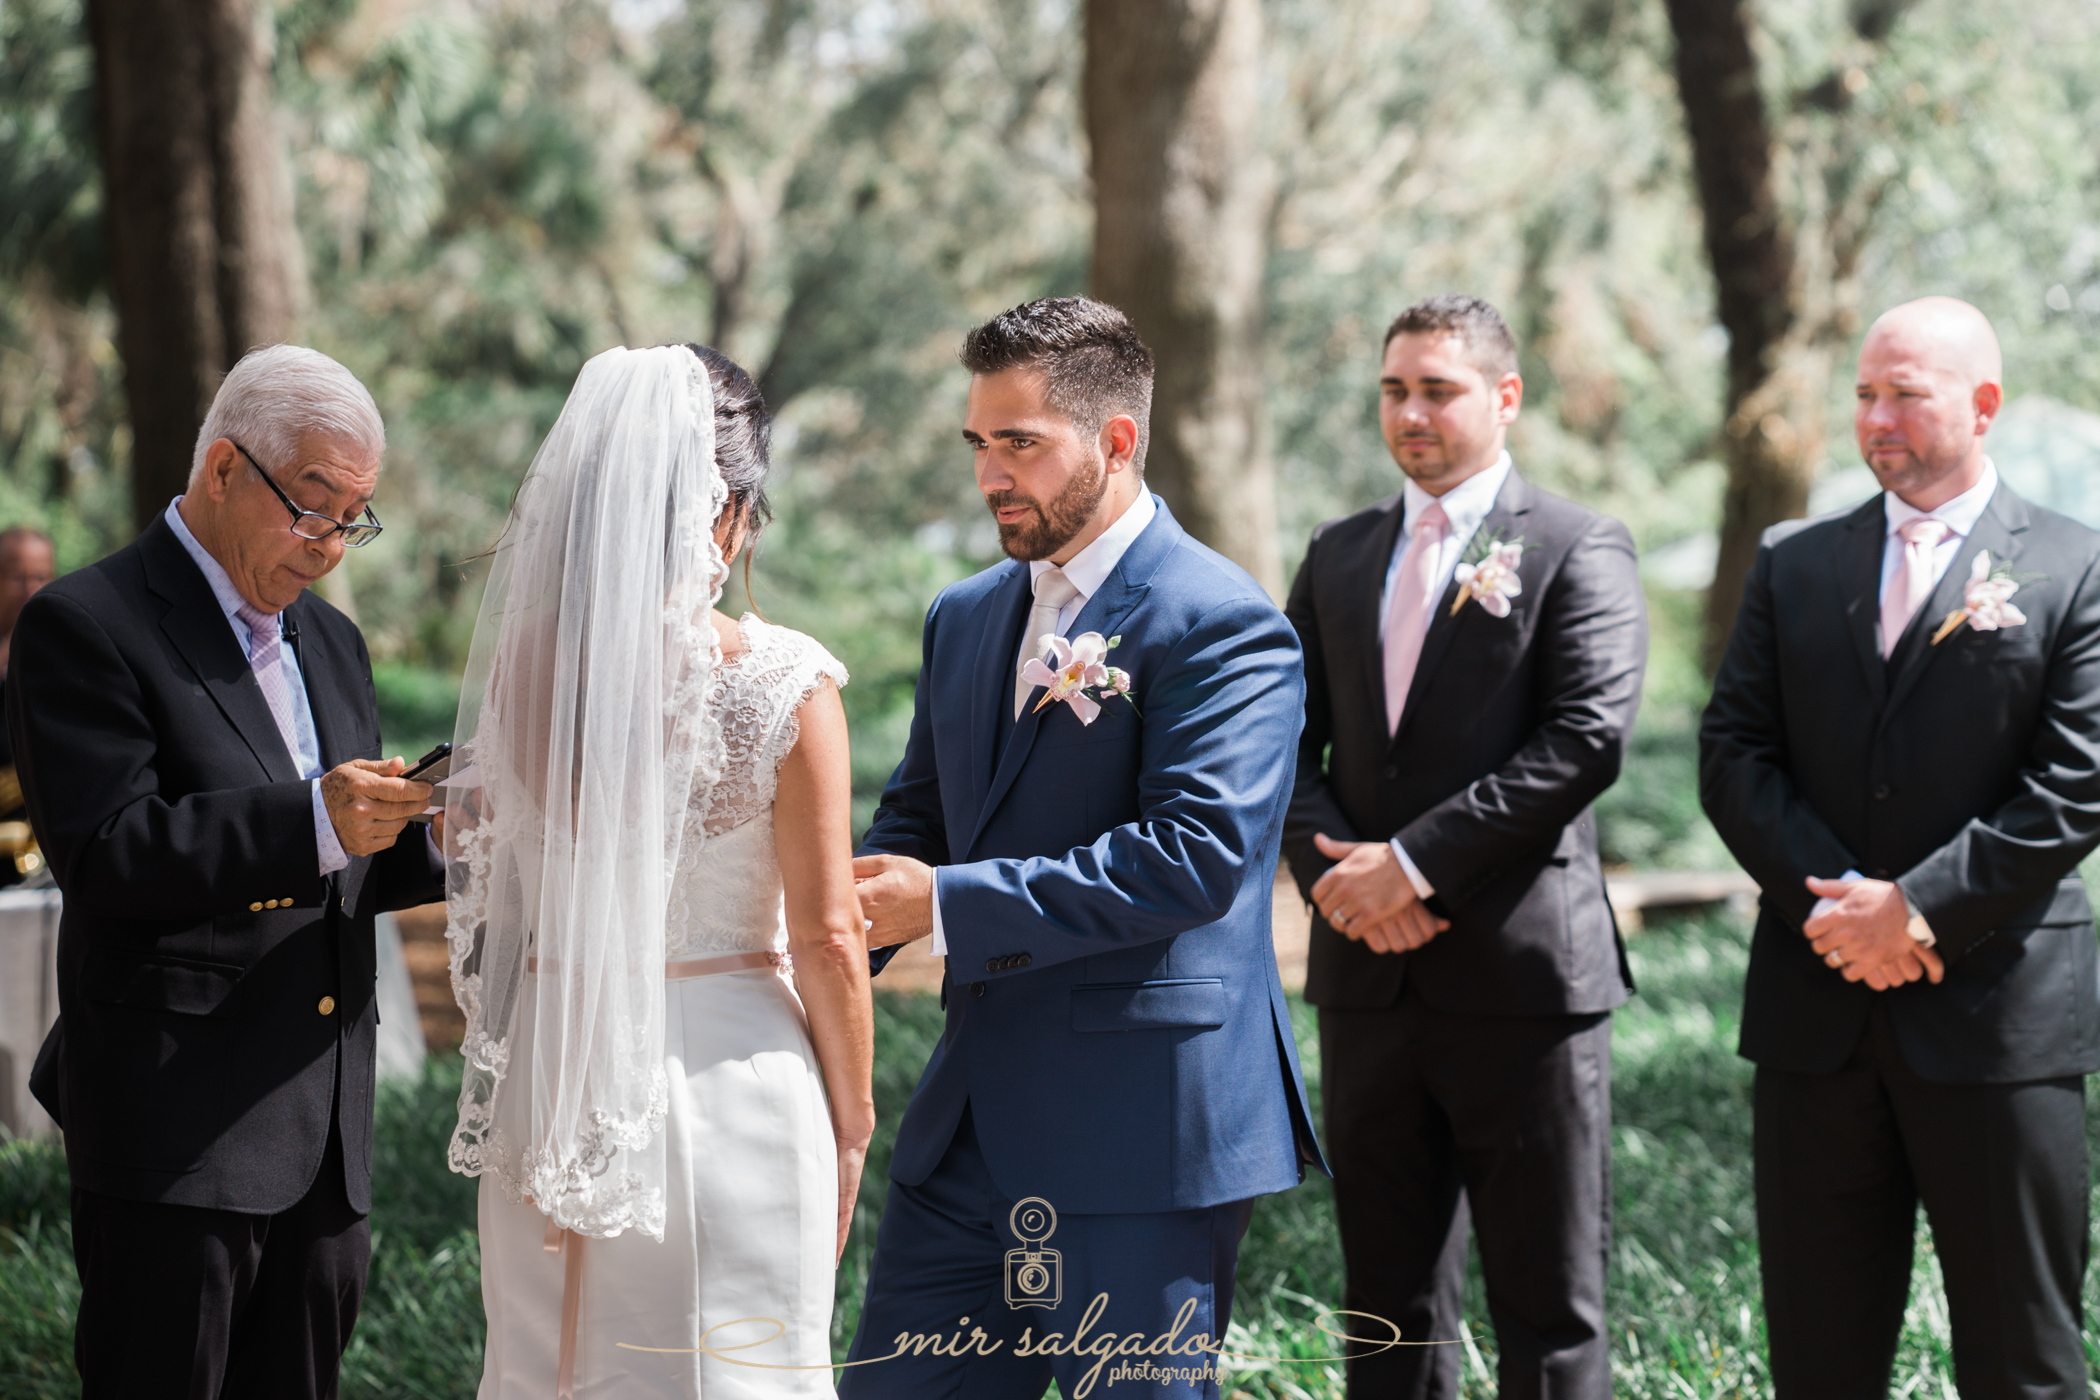 Bok-tower-gardens-wedding-ceremony-photo, Tampa-wedding-photo